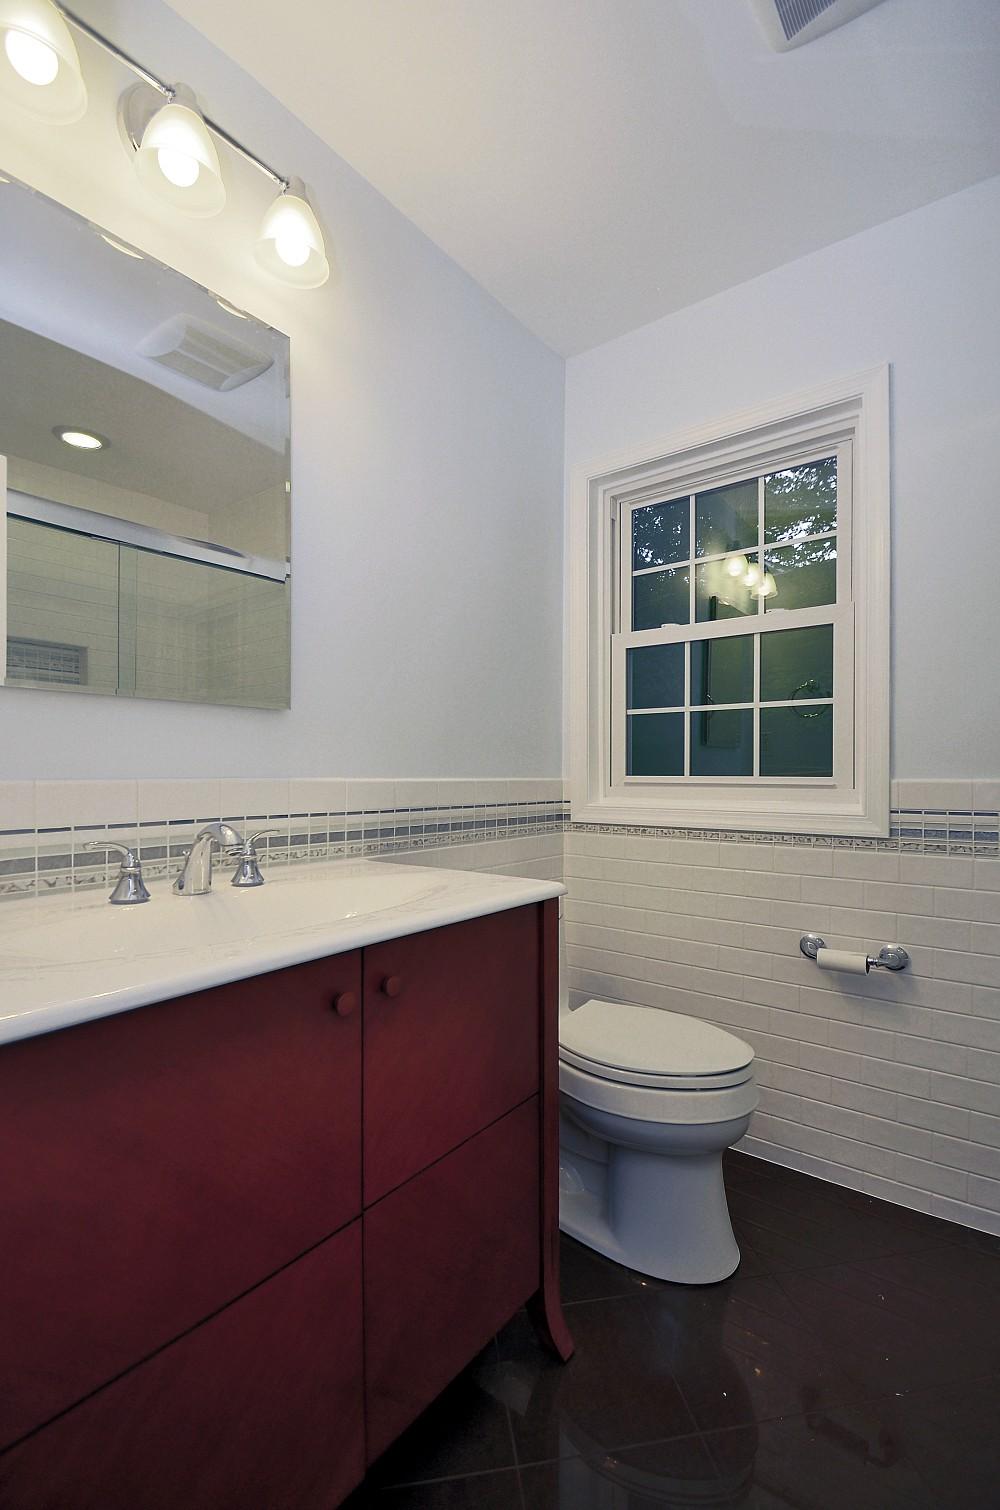 Home Breakthrough LLC Networx - Bathroom remodeling hagerstown md